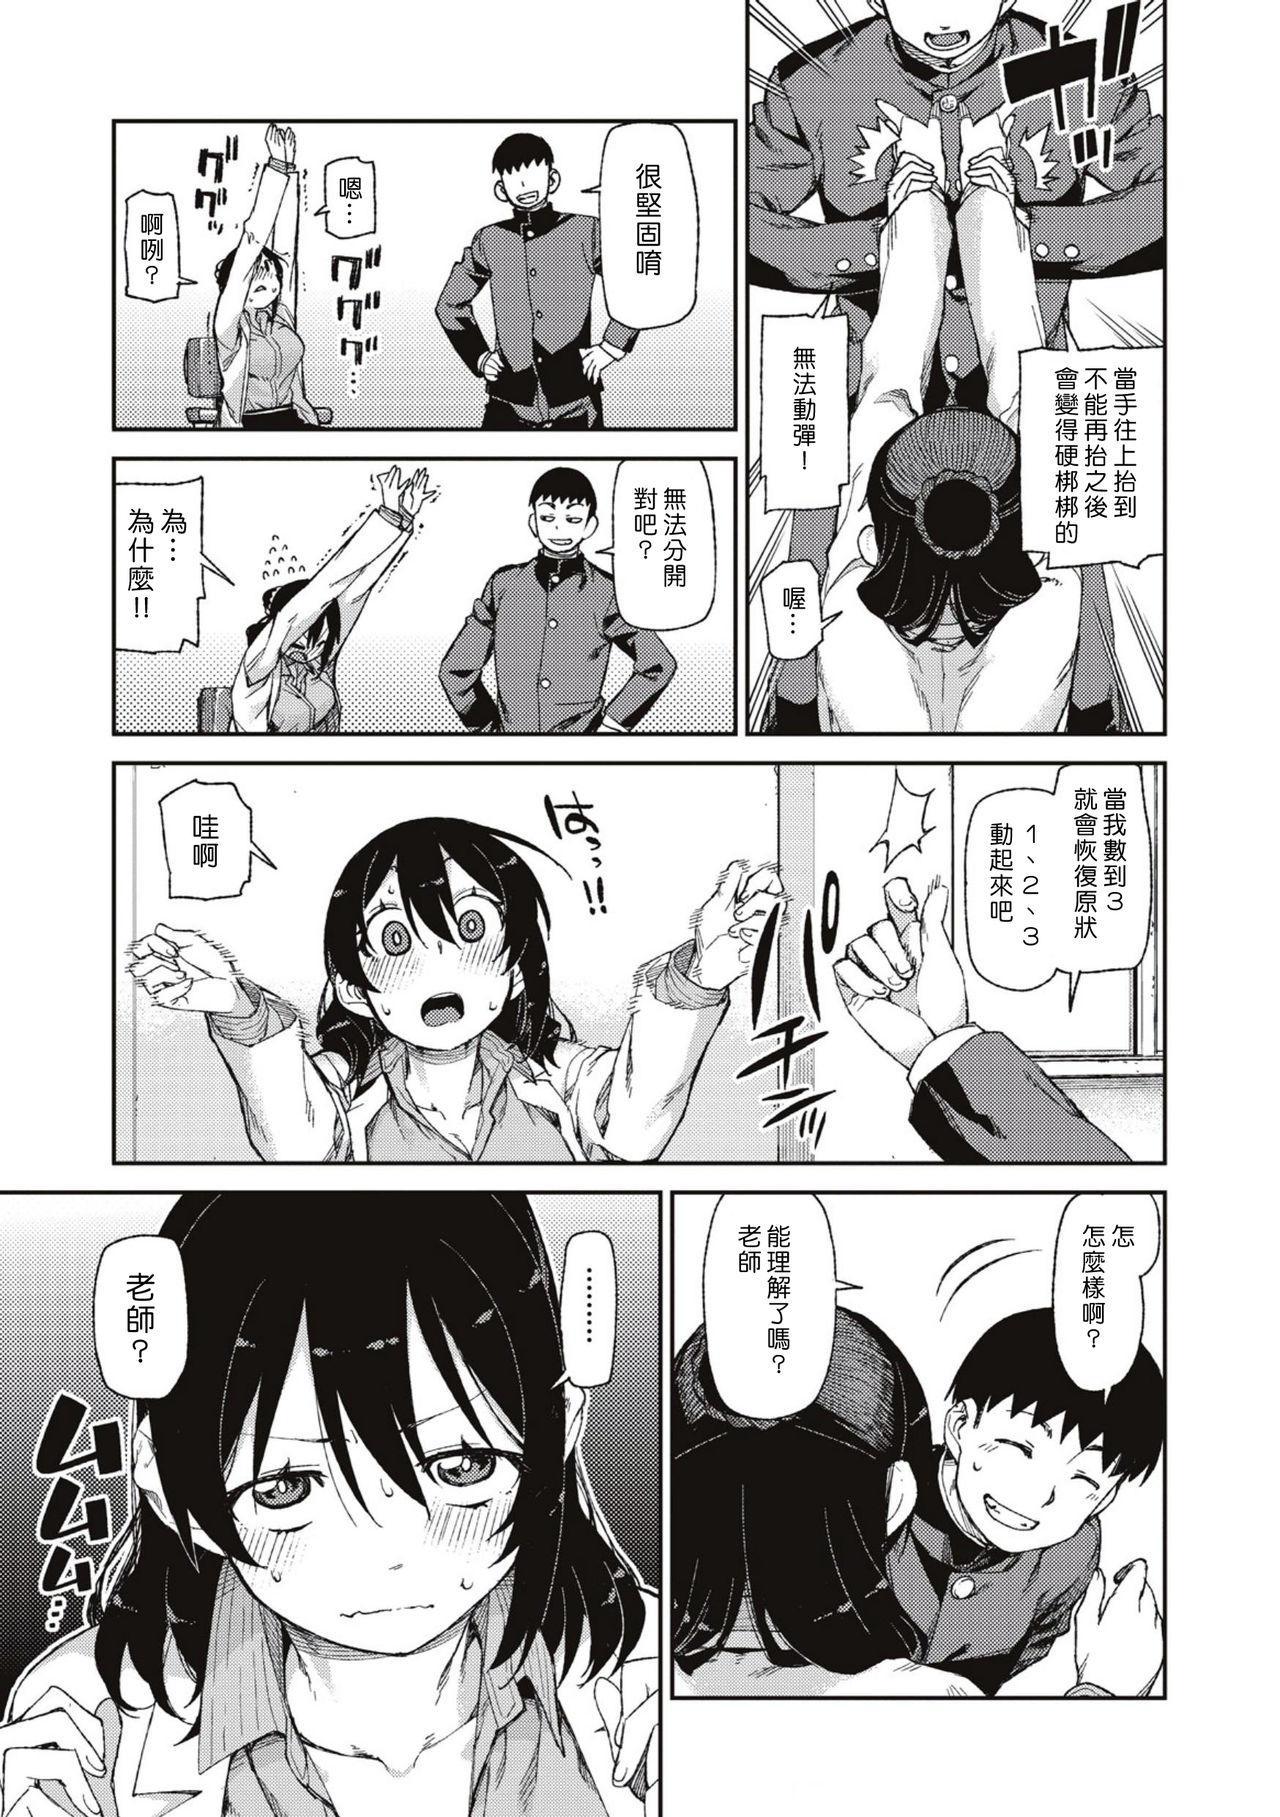 Himitsu no onedari 6